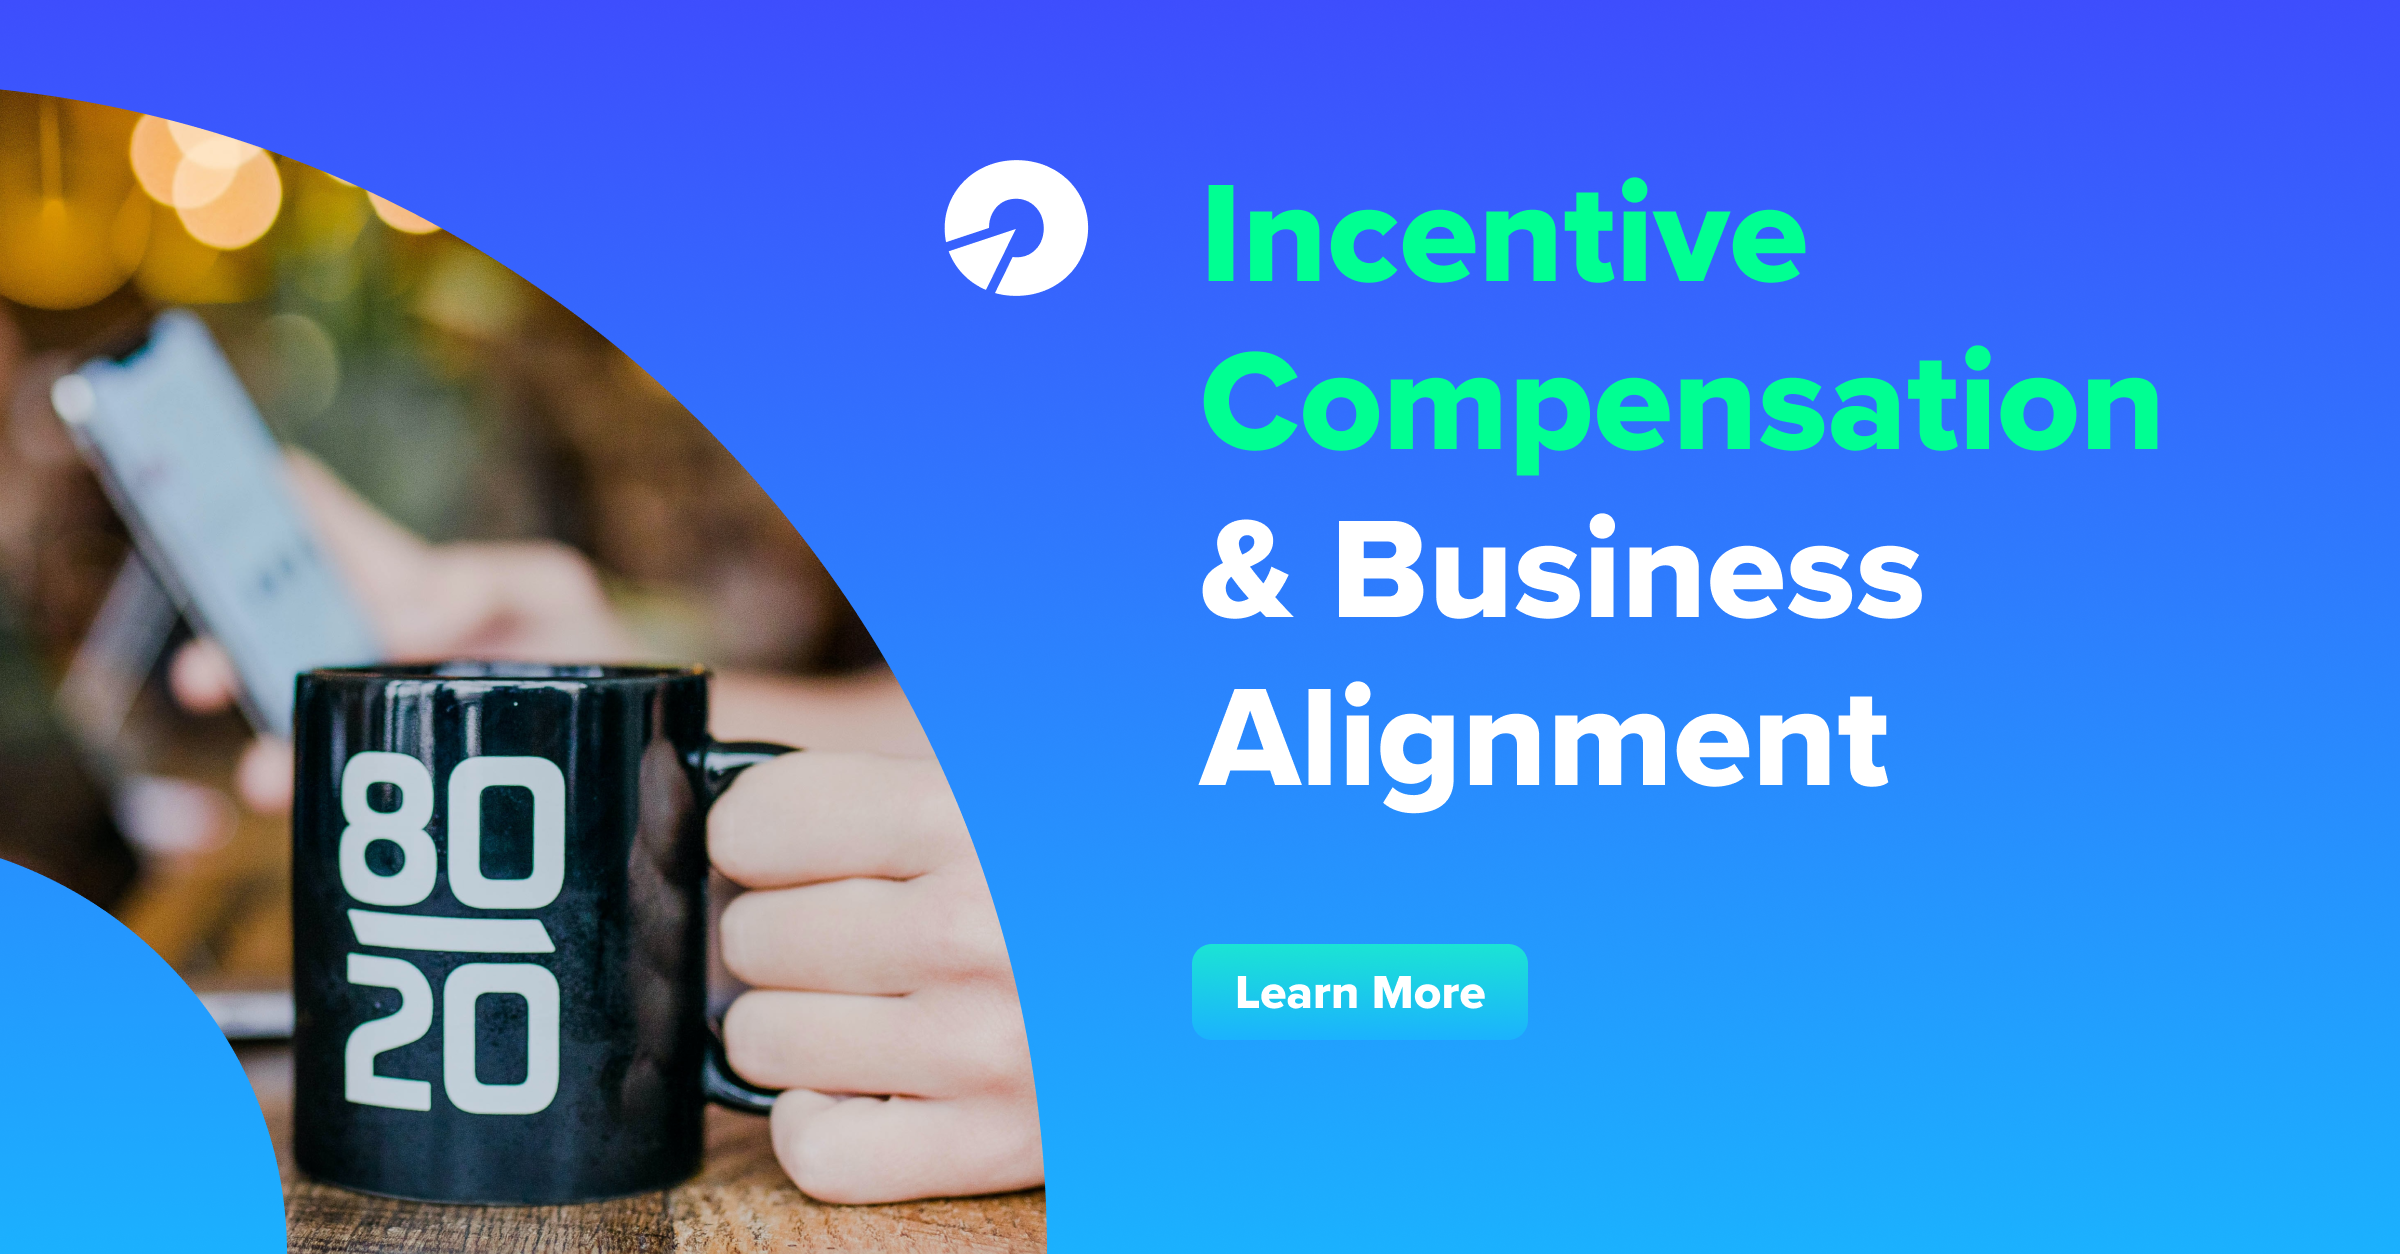 Incentive Compensation & Business Alignment